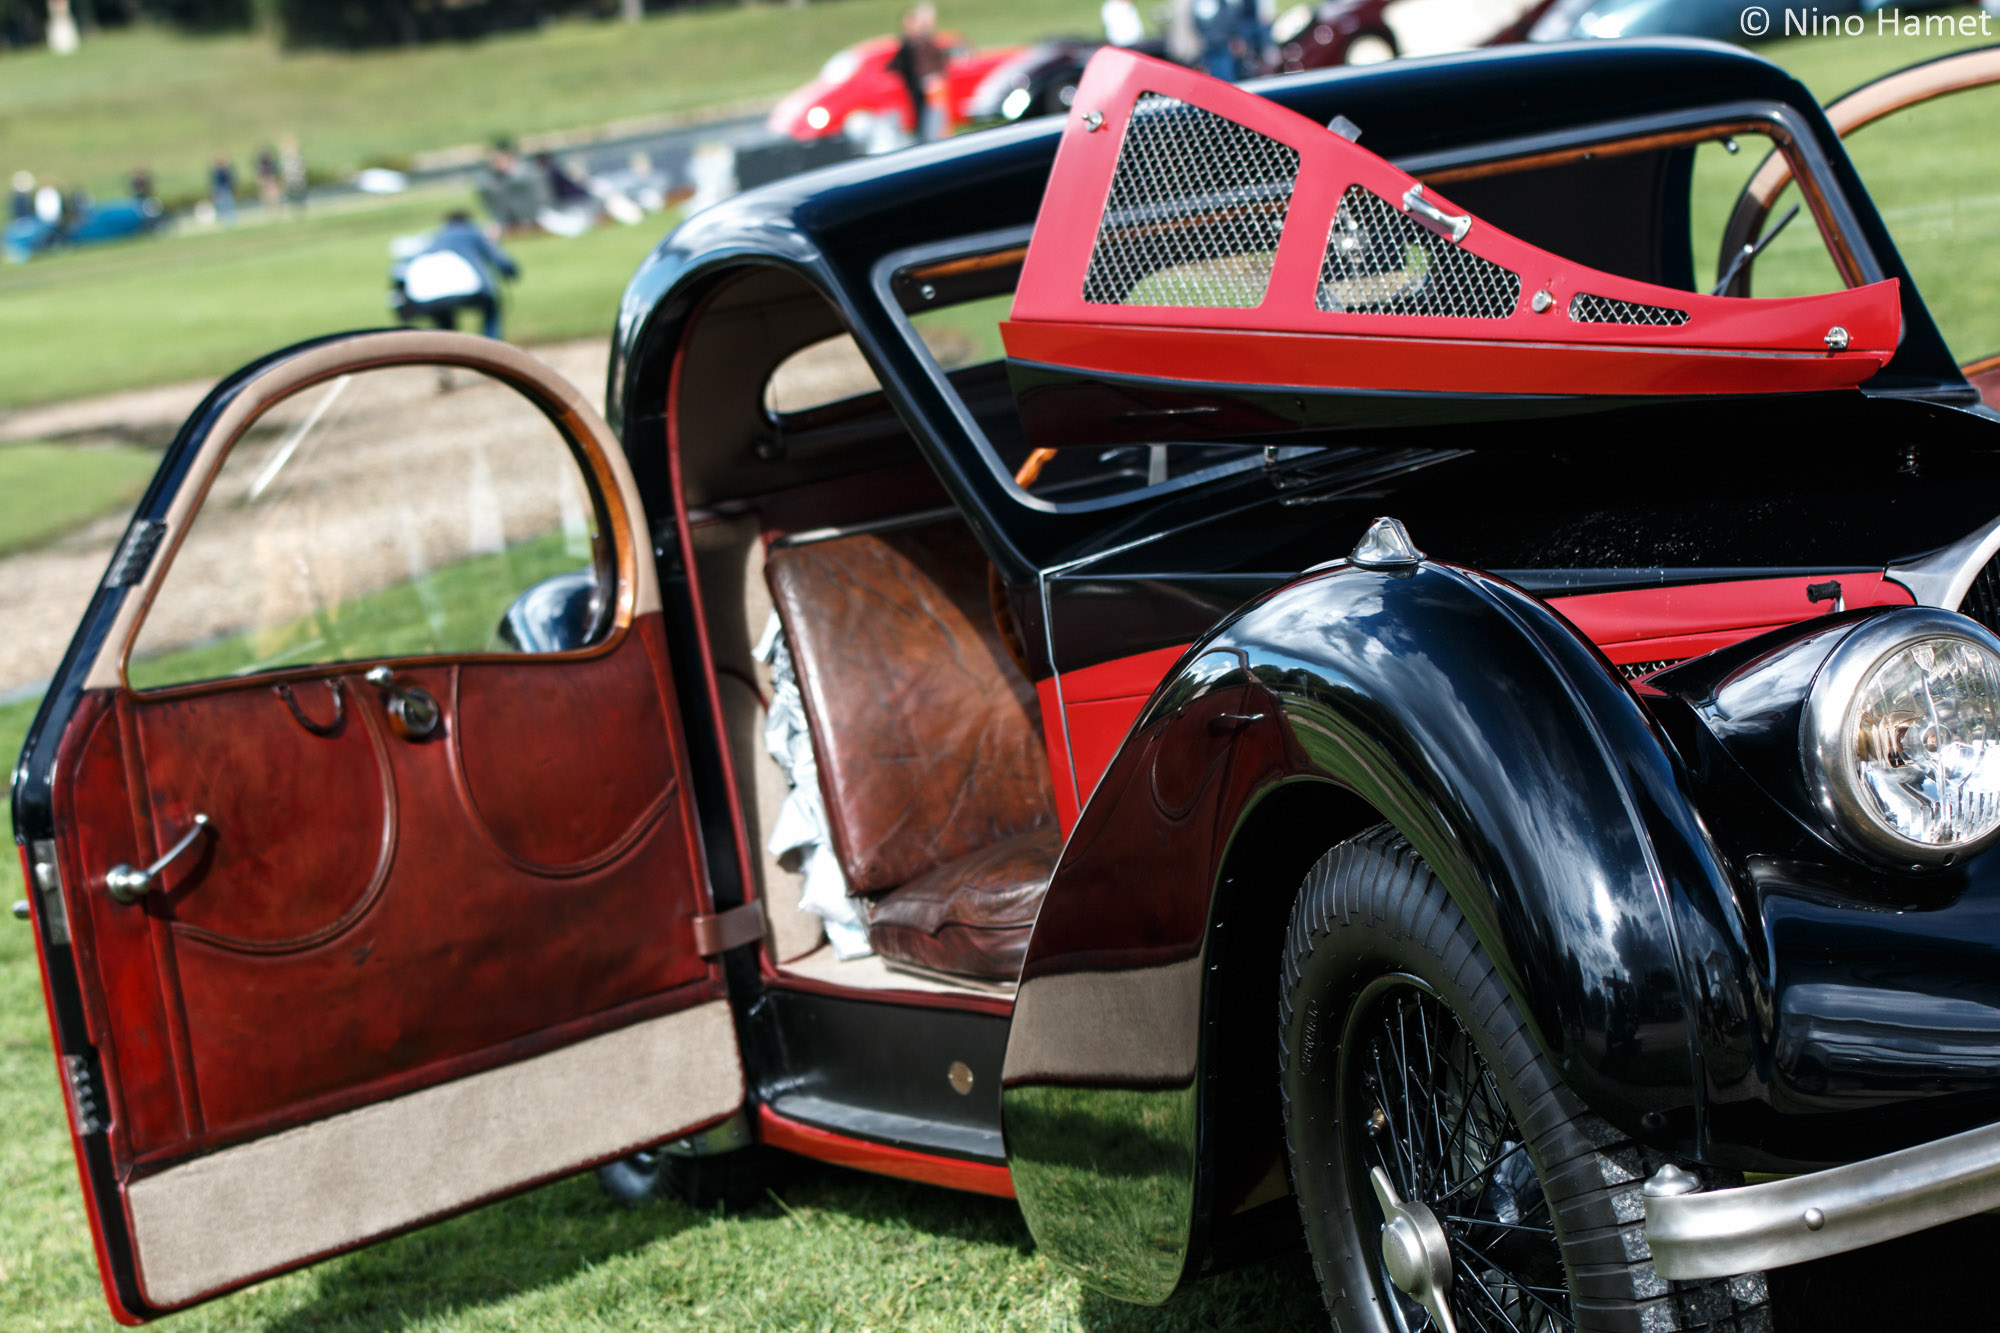 Bugatti Type 57 SC Atalante #57542 – 1937